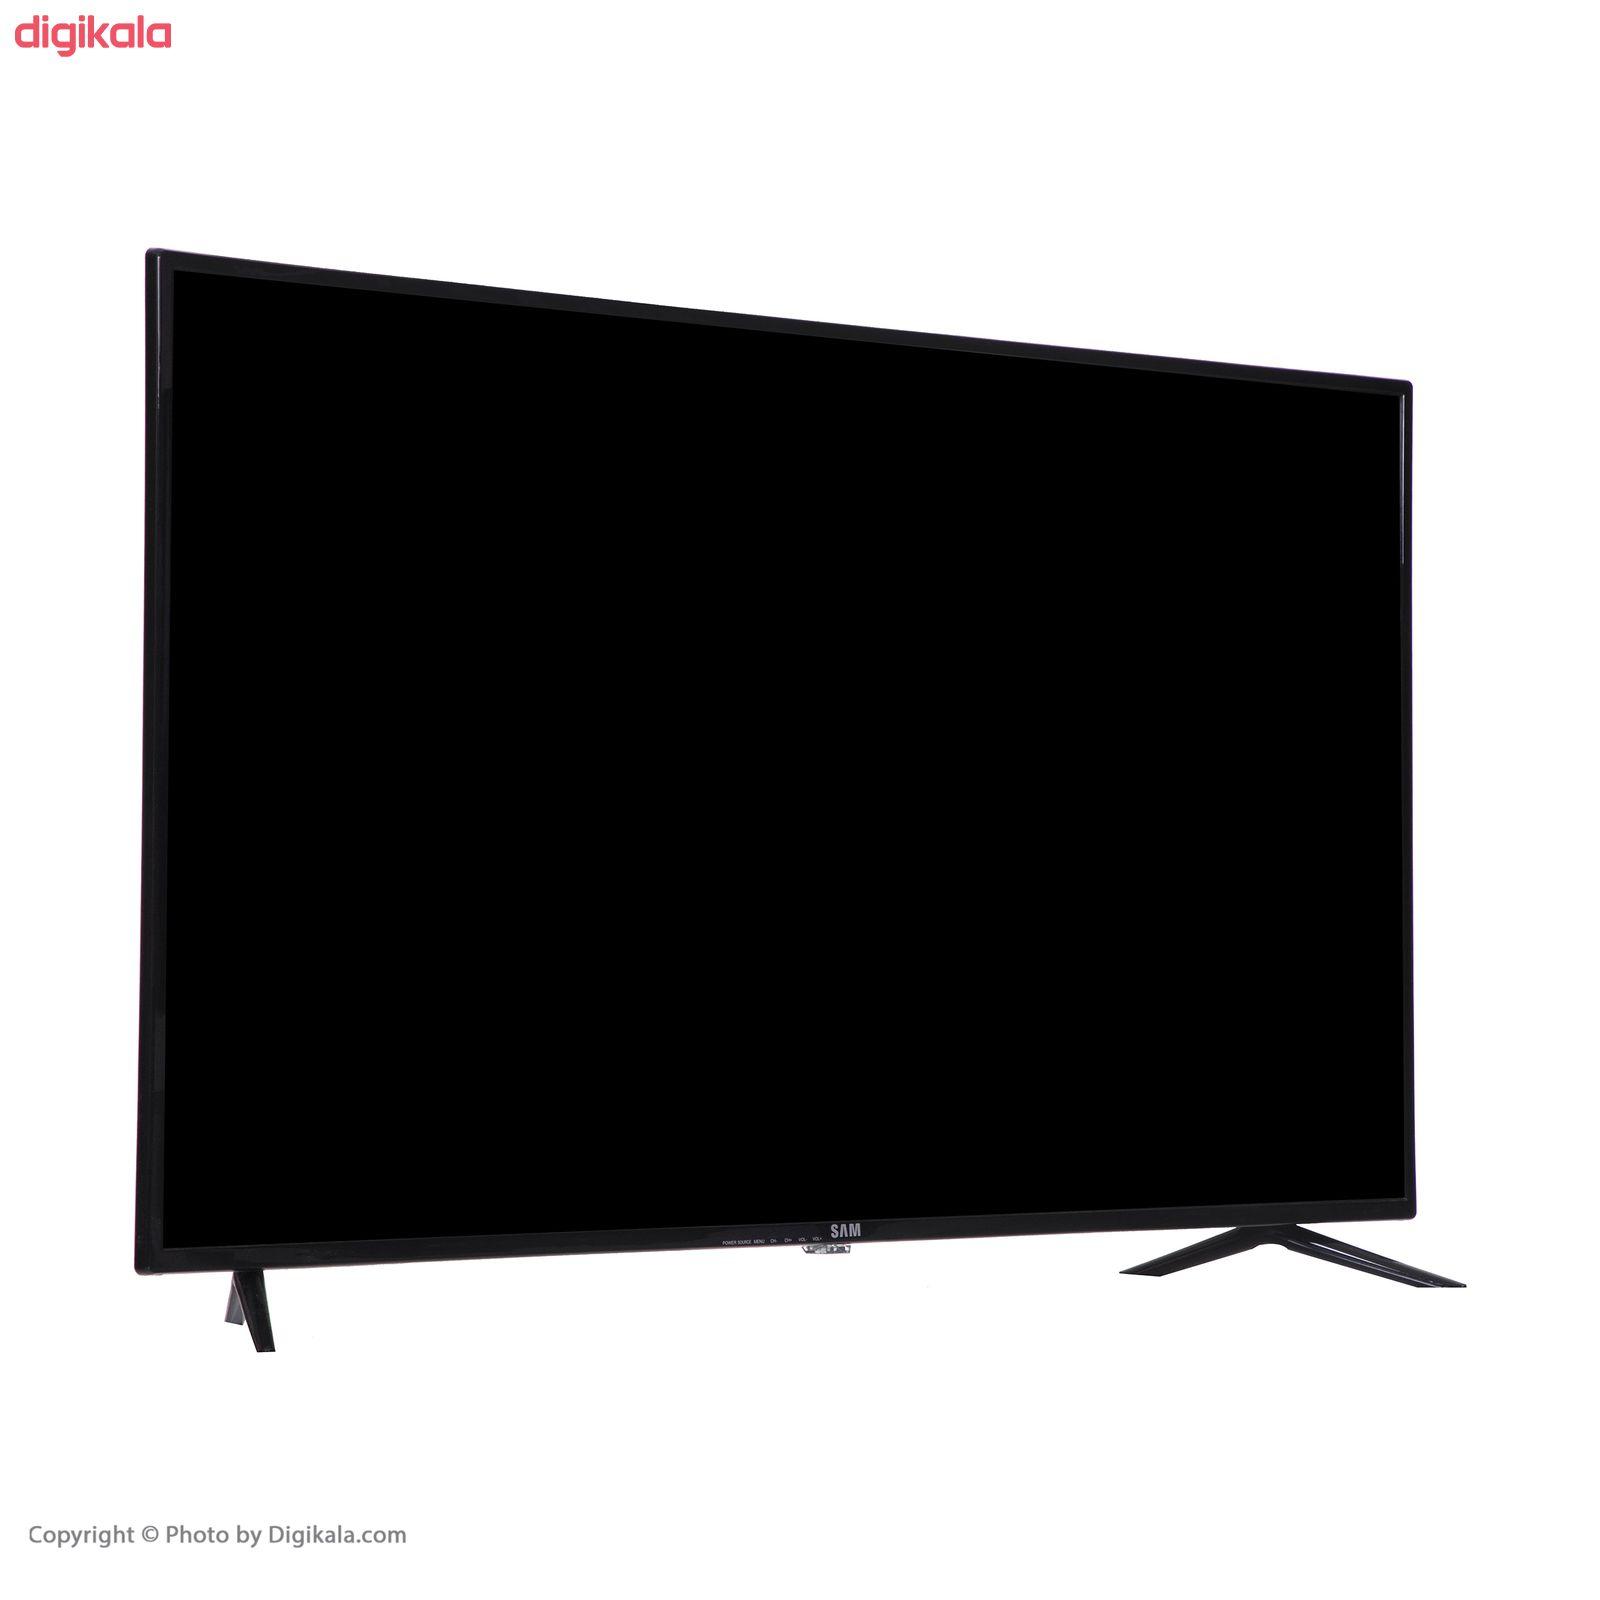 تلویزیون ال ای دی هوشمند سام الکترونیک مدل UA43T5500TH سایز ۴۳ اینچ main 1 2